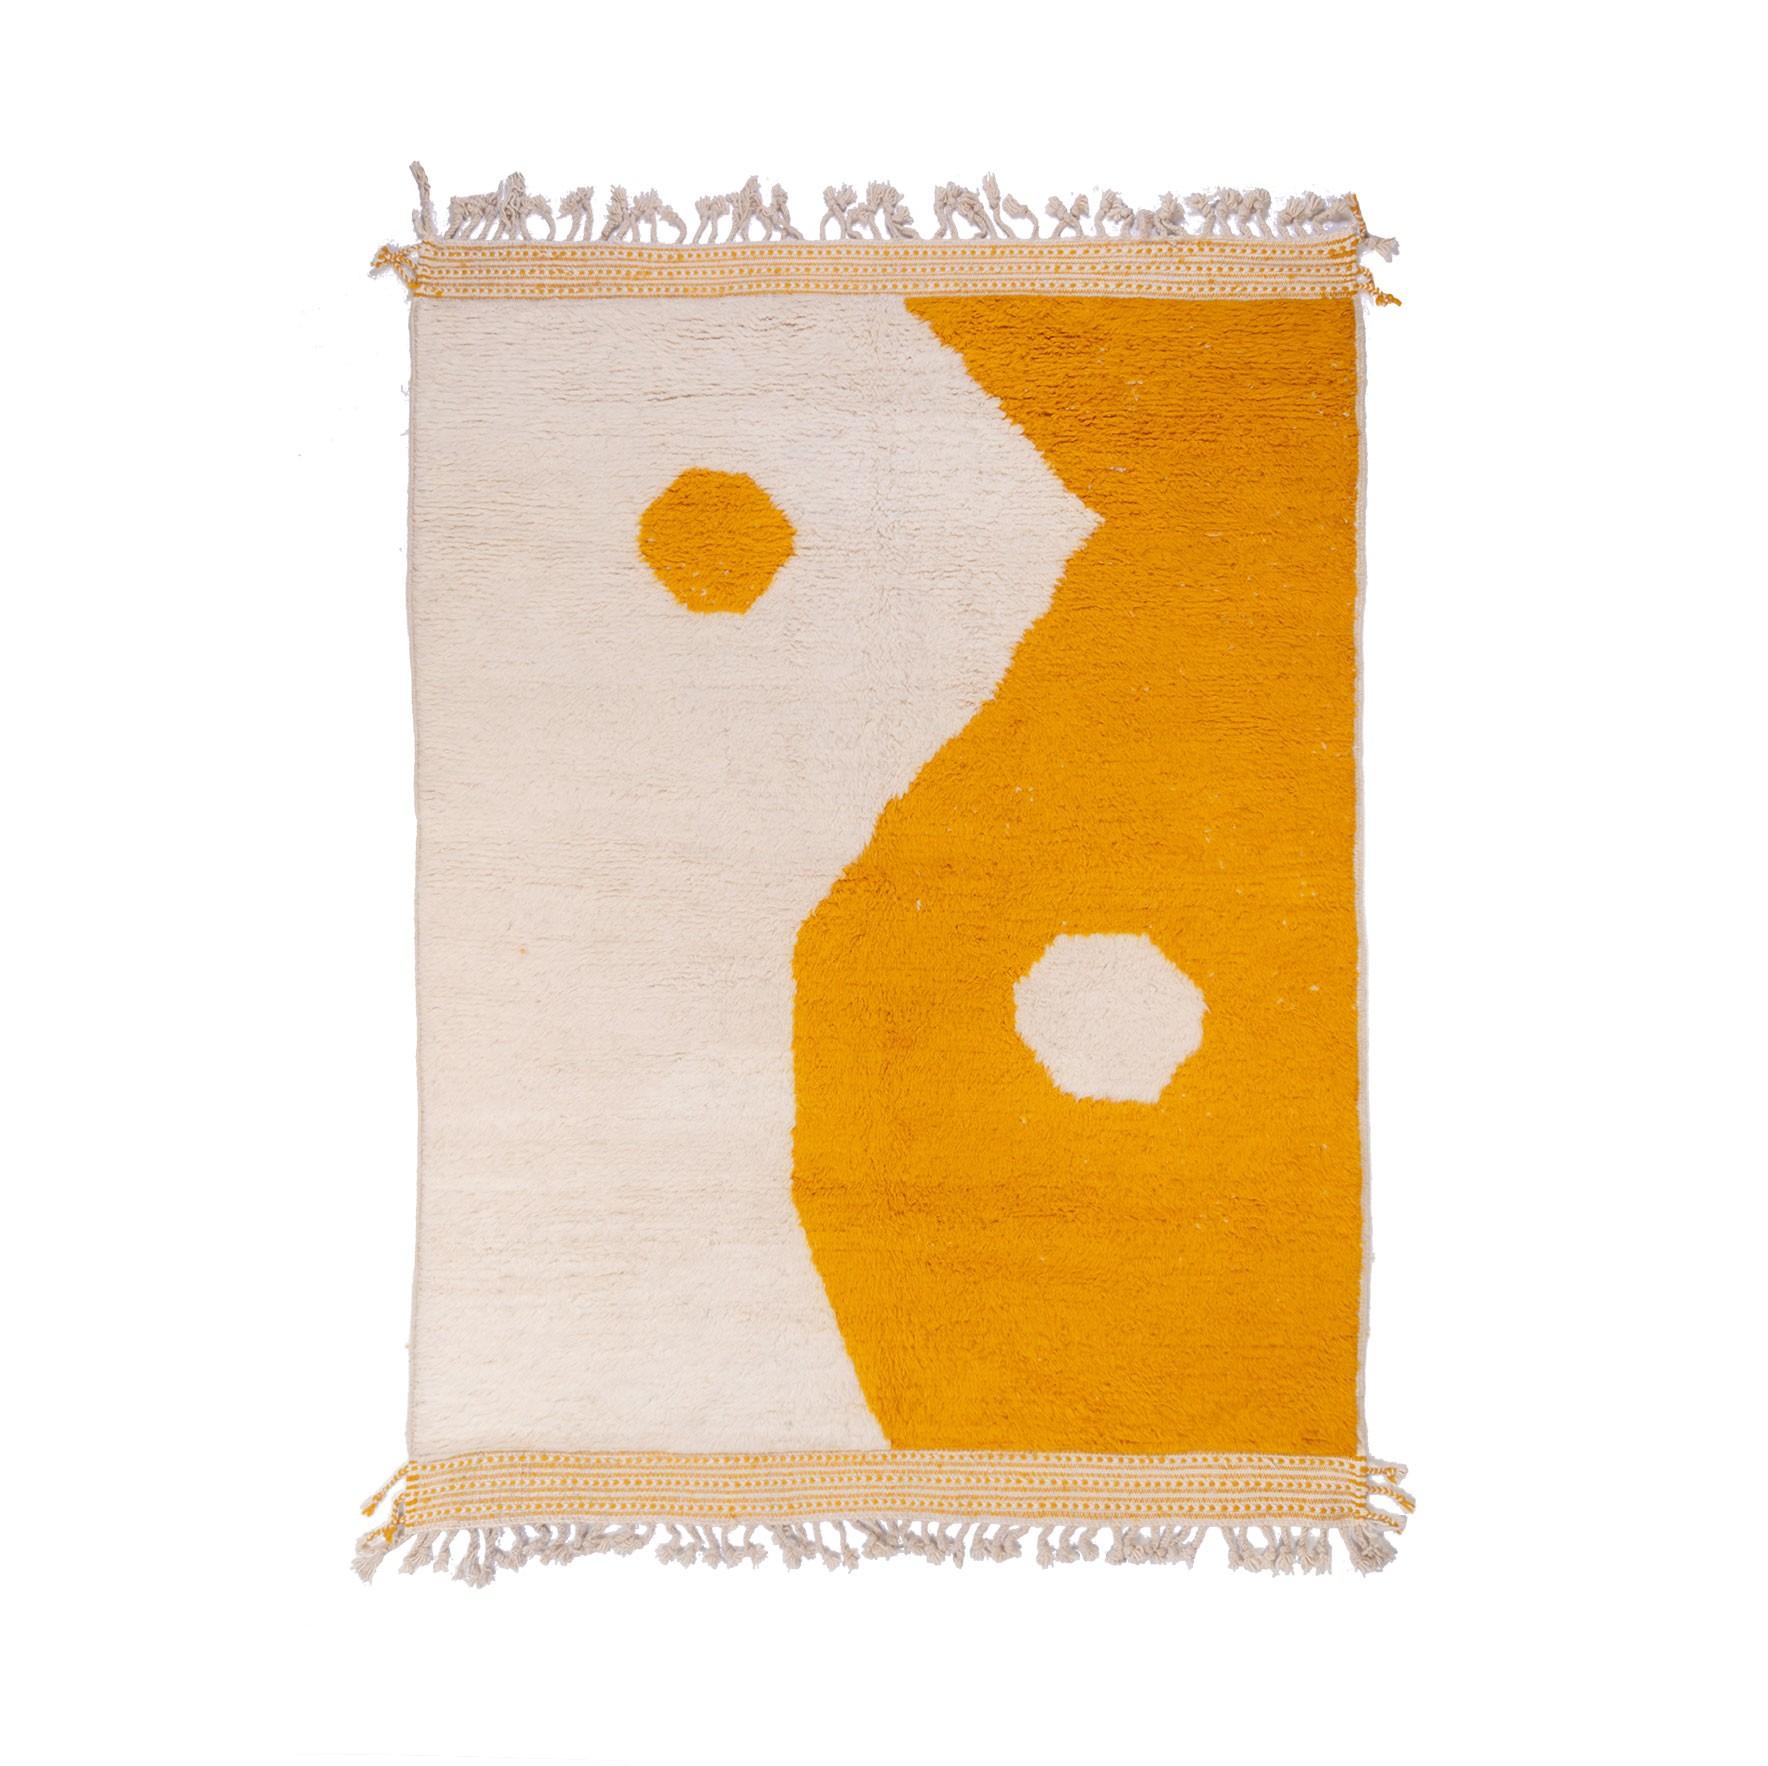 Tapis Beni Ouarain façon Ying et Yang en jaune et blanc